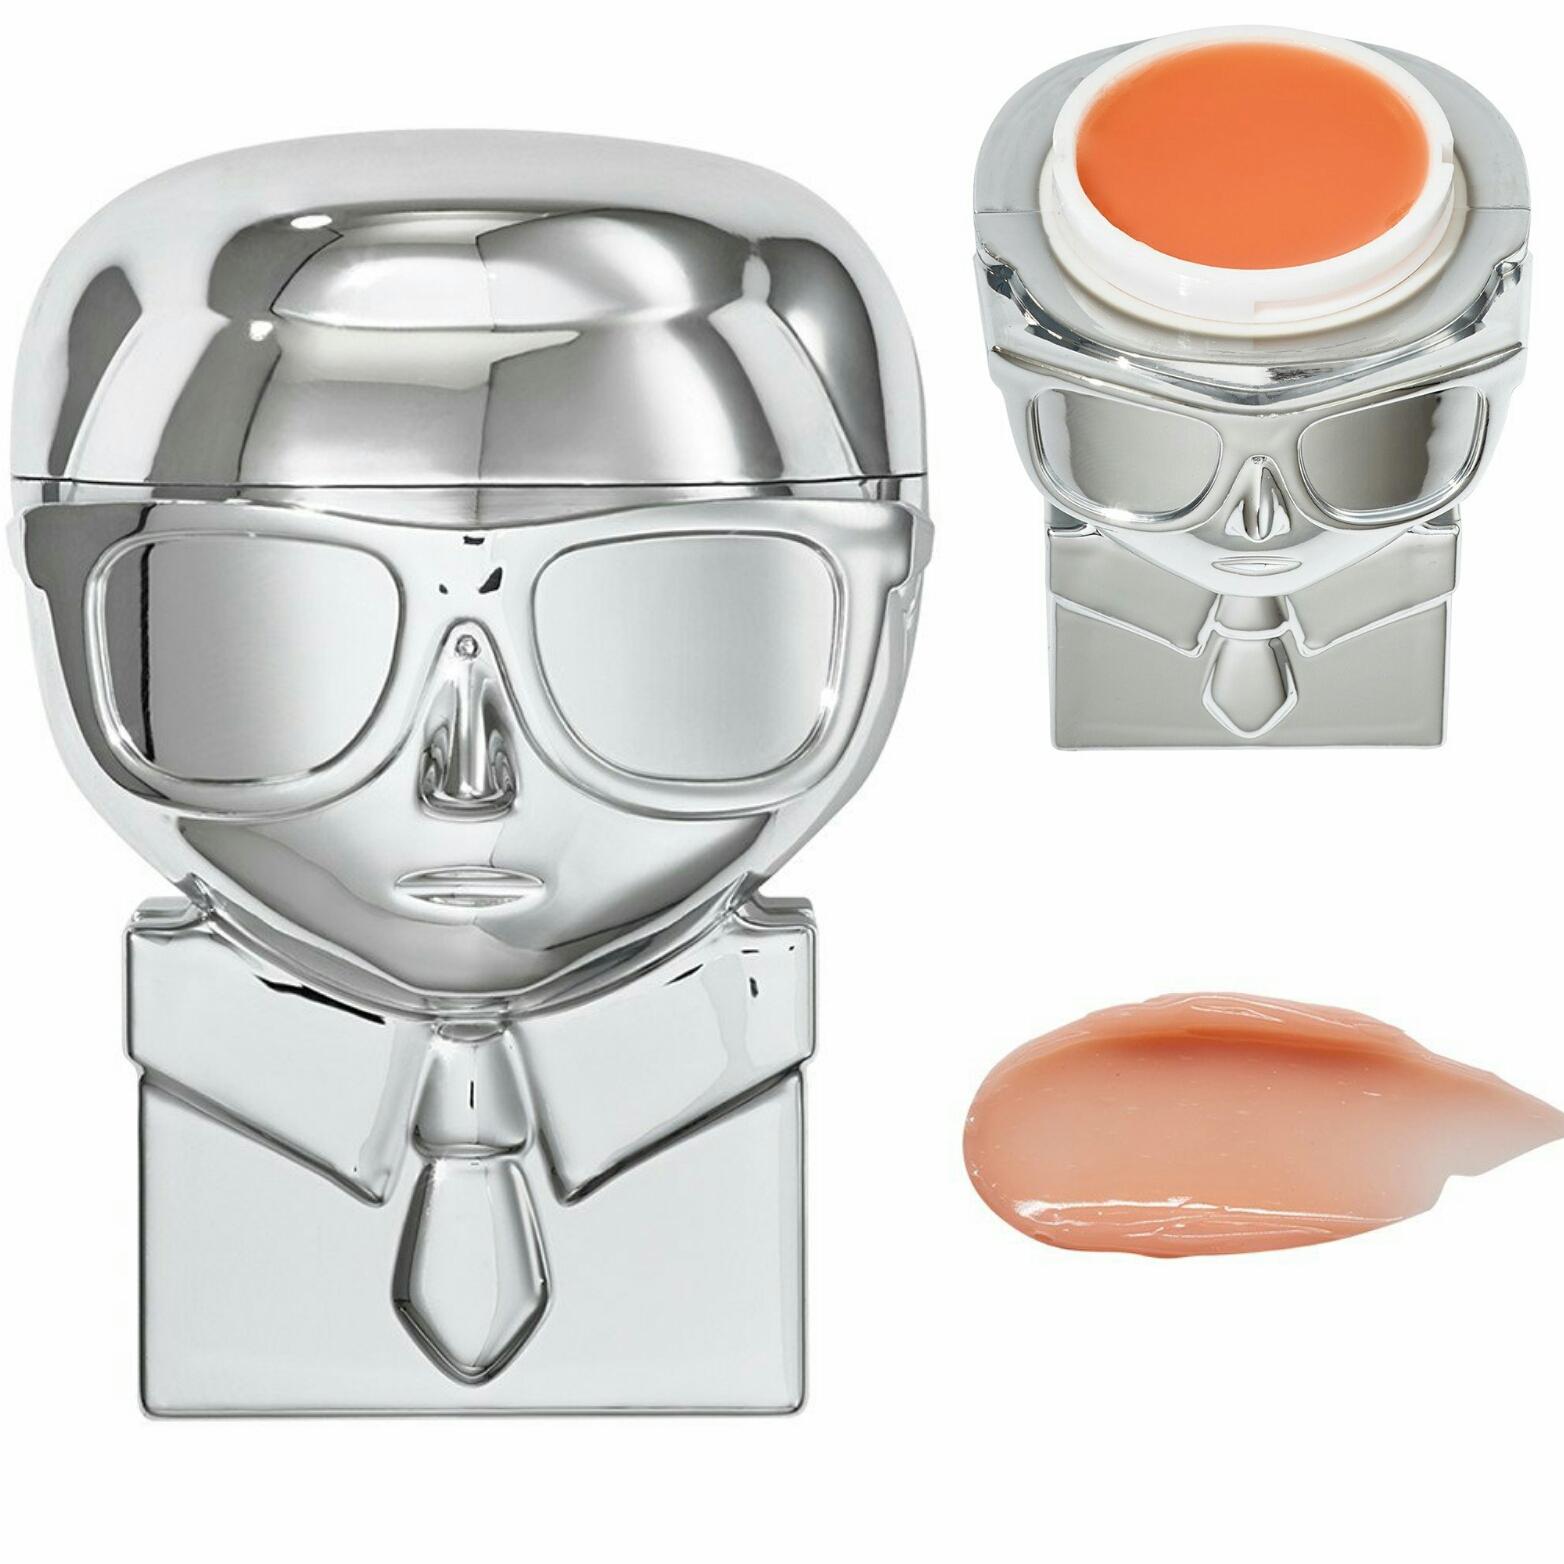 lipbalm-karl-lagerfeld-makeup